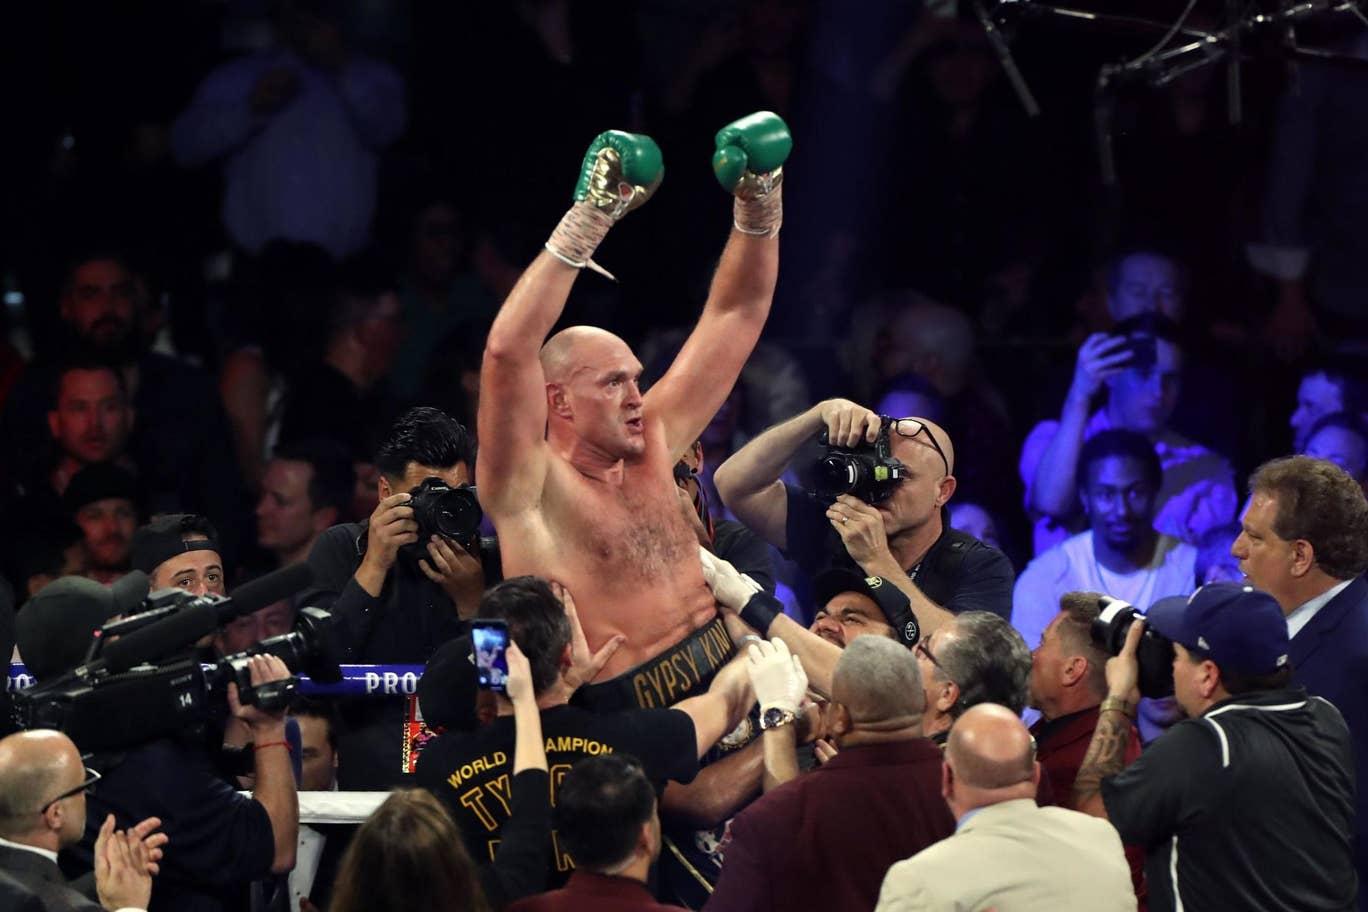 Tyson Fury defeats Deontay Wilder